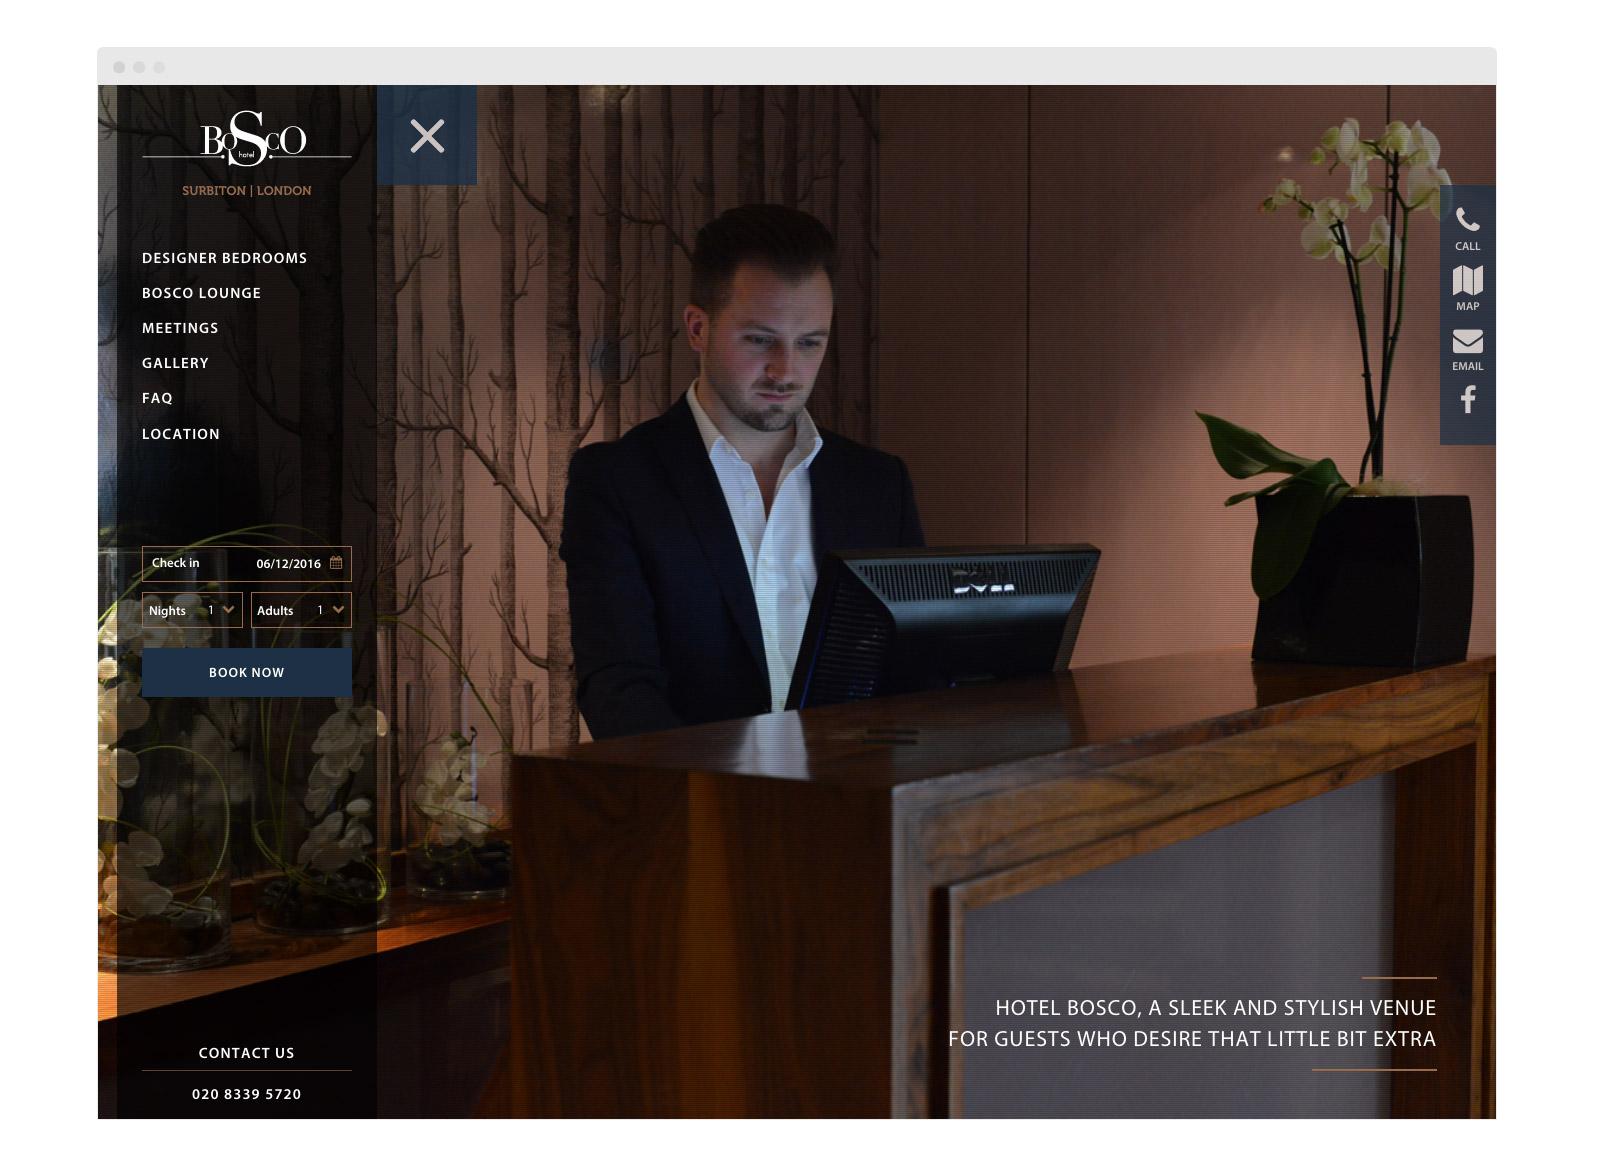 Bosco website homepage